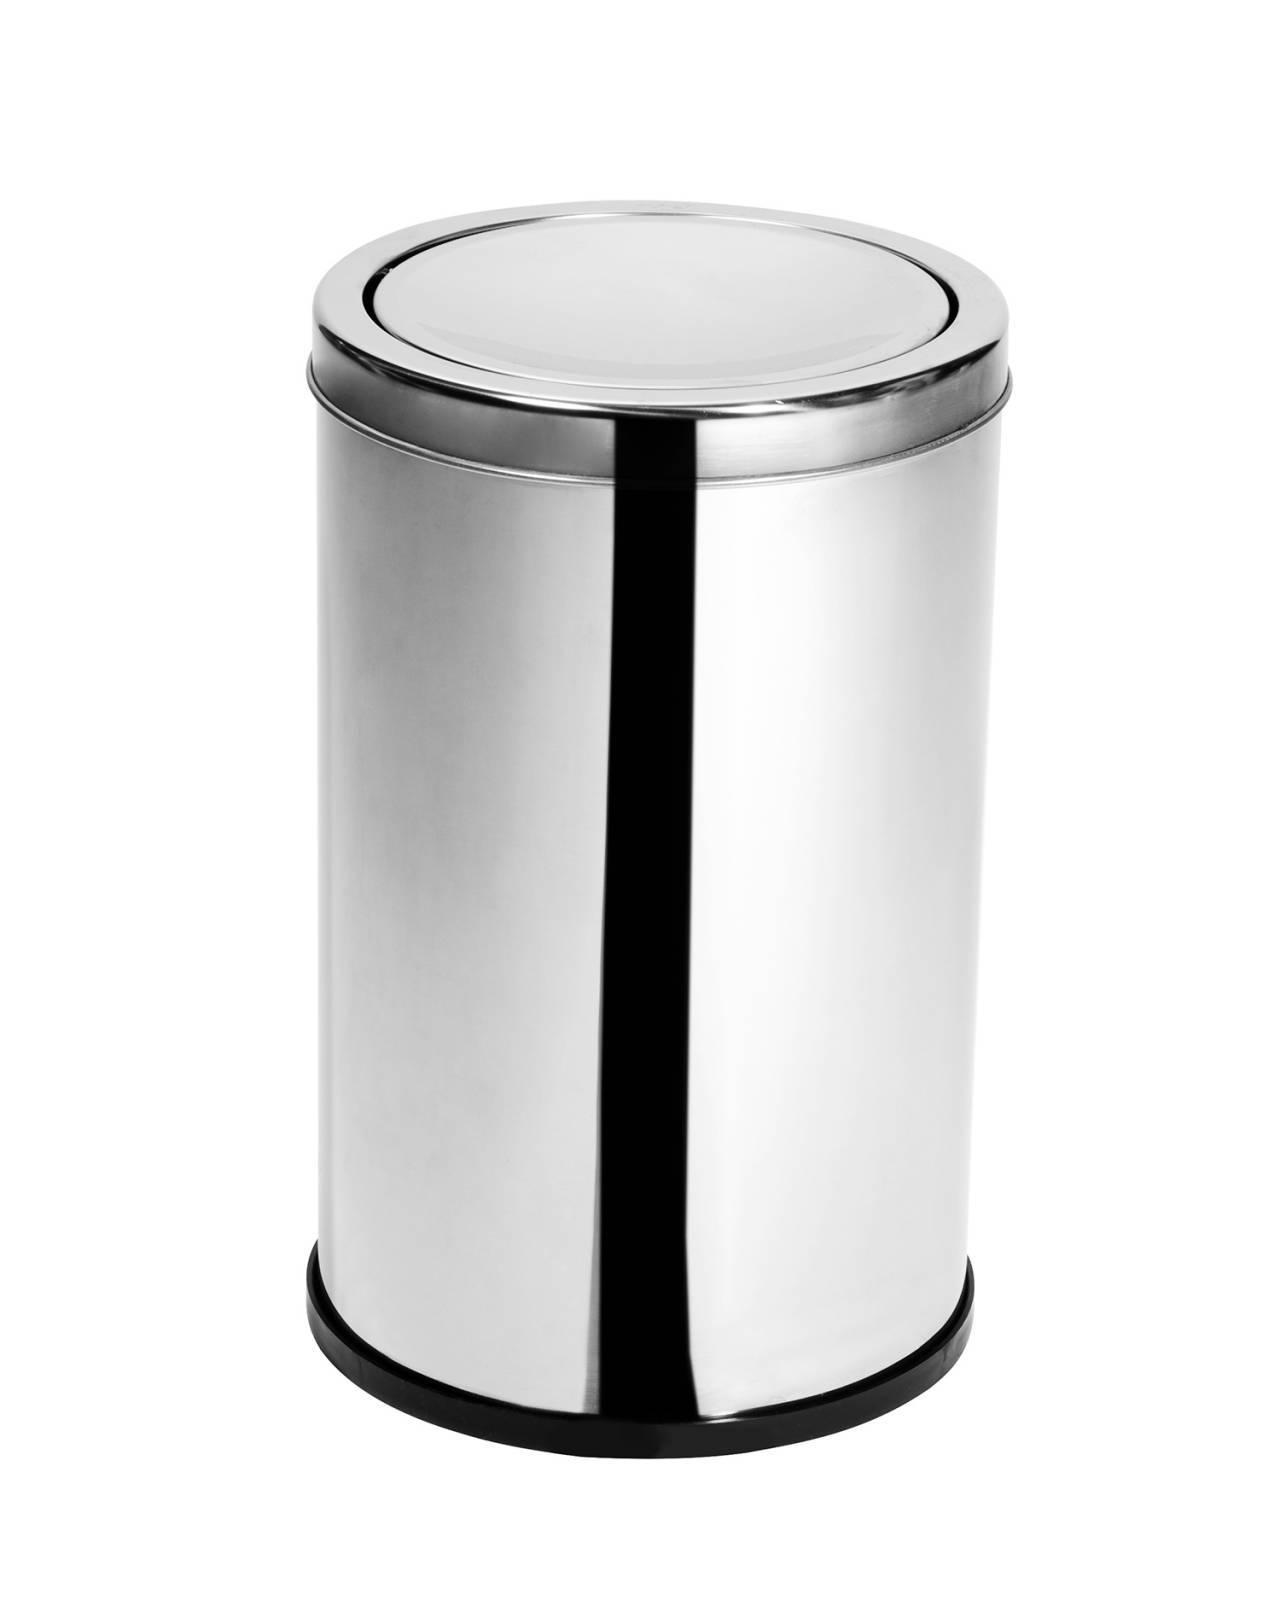 Lixeira Inox c/ Tampa Basculante 10 Litros - Elegance